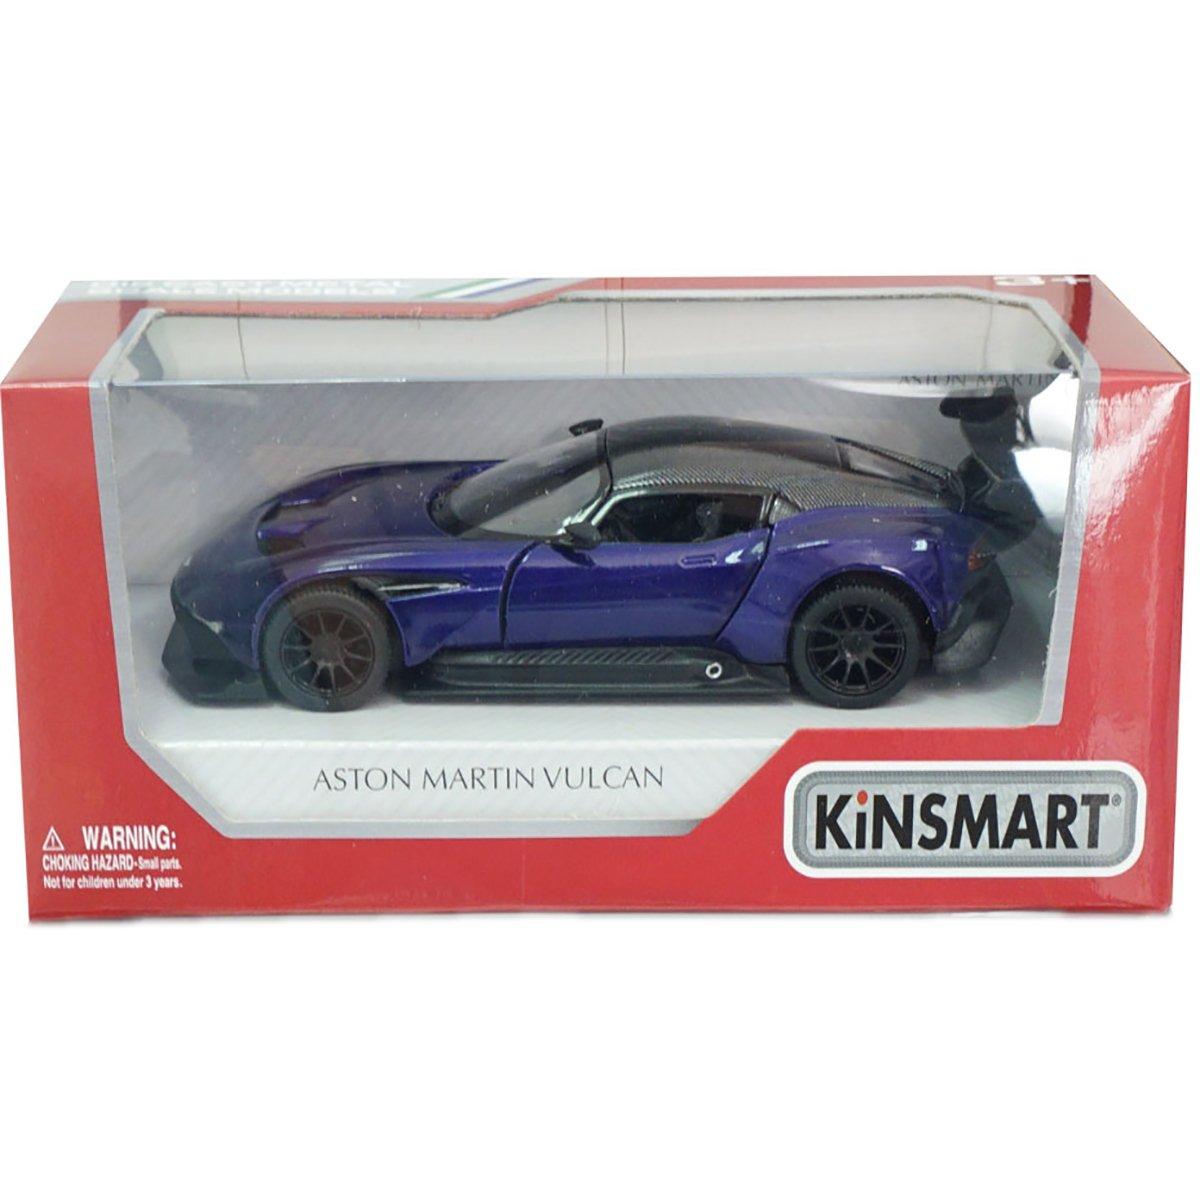 Masinuta din metal Kinsmart, Aston Martin Vulcan, Mov